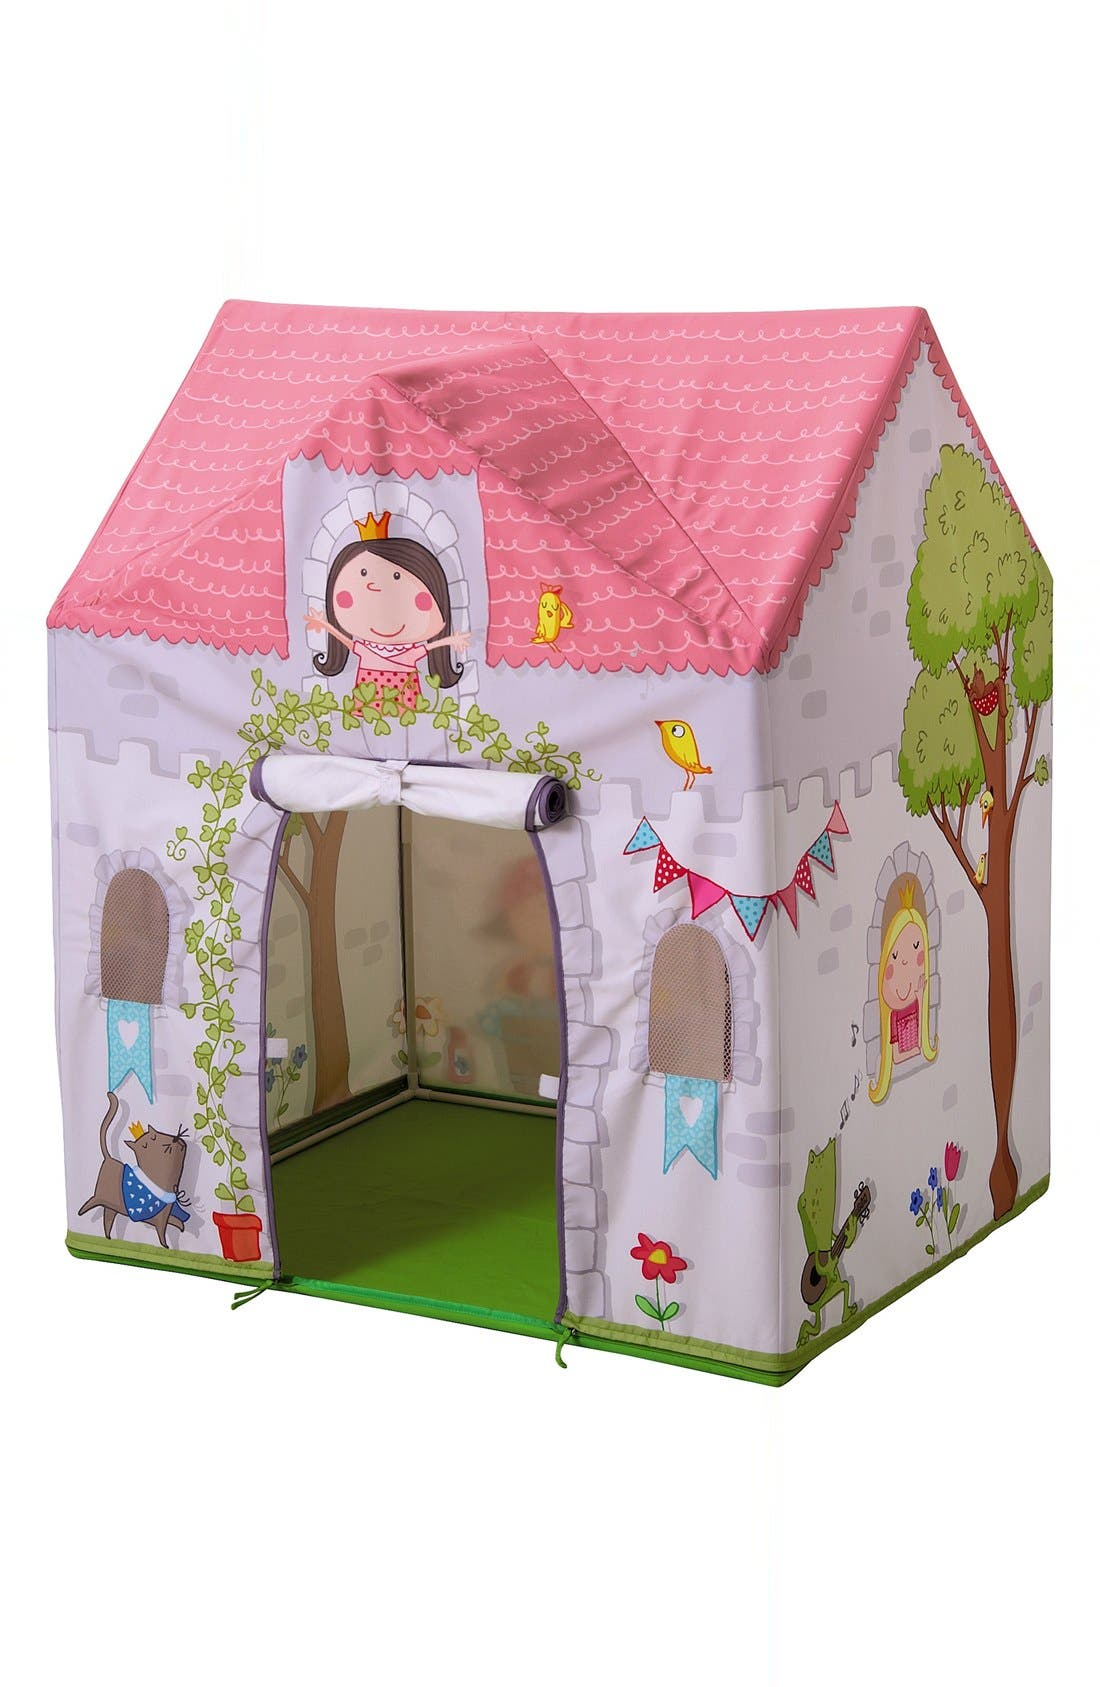 'Princess Rosalina' Play Tent,                         Main,                         color, 650